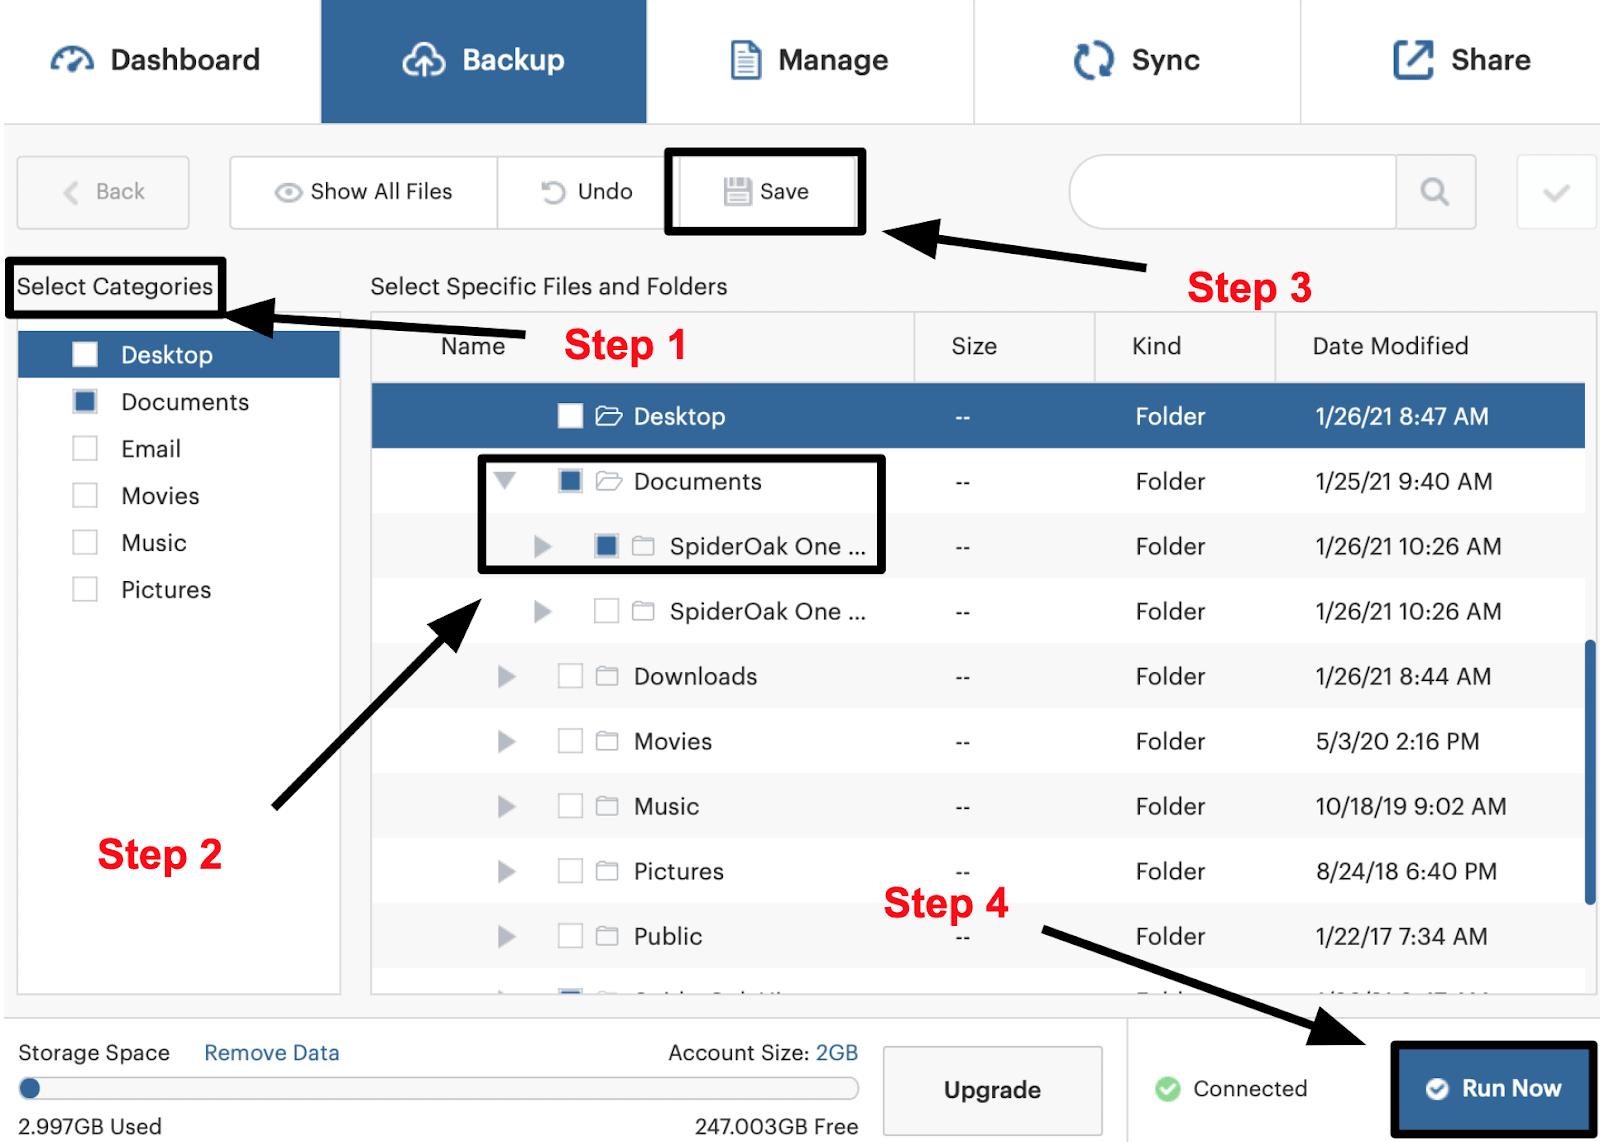 SpiderOak One steps to choose files for backup